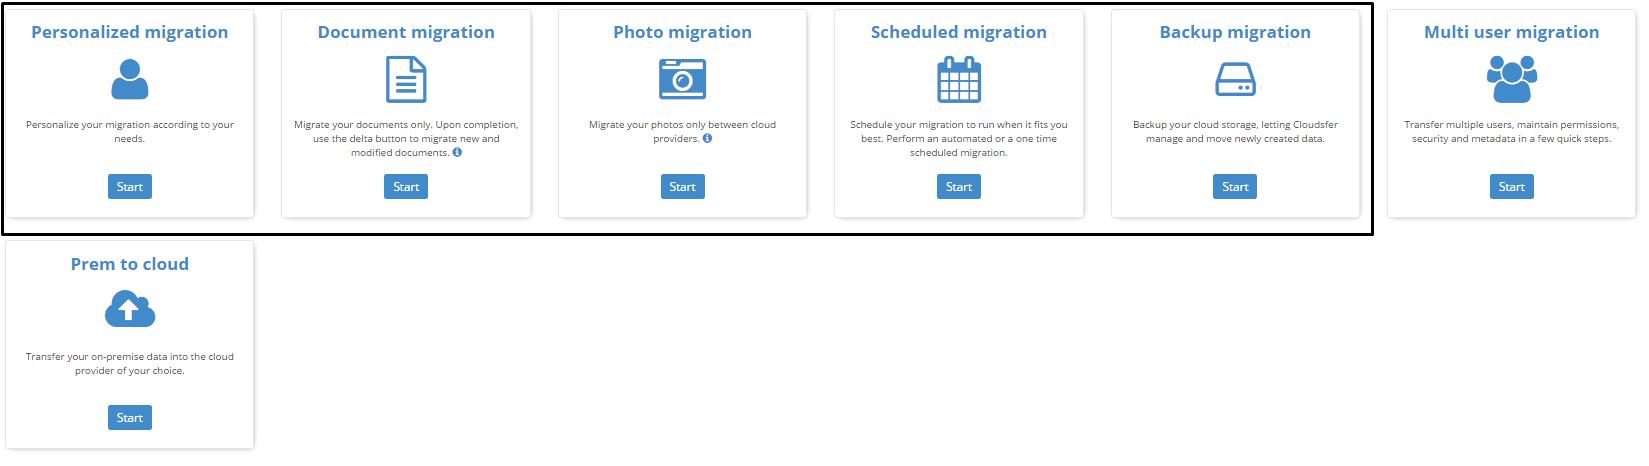 Cloudsfer: Migrating using Backblaze B2 : Cloudsfer Support